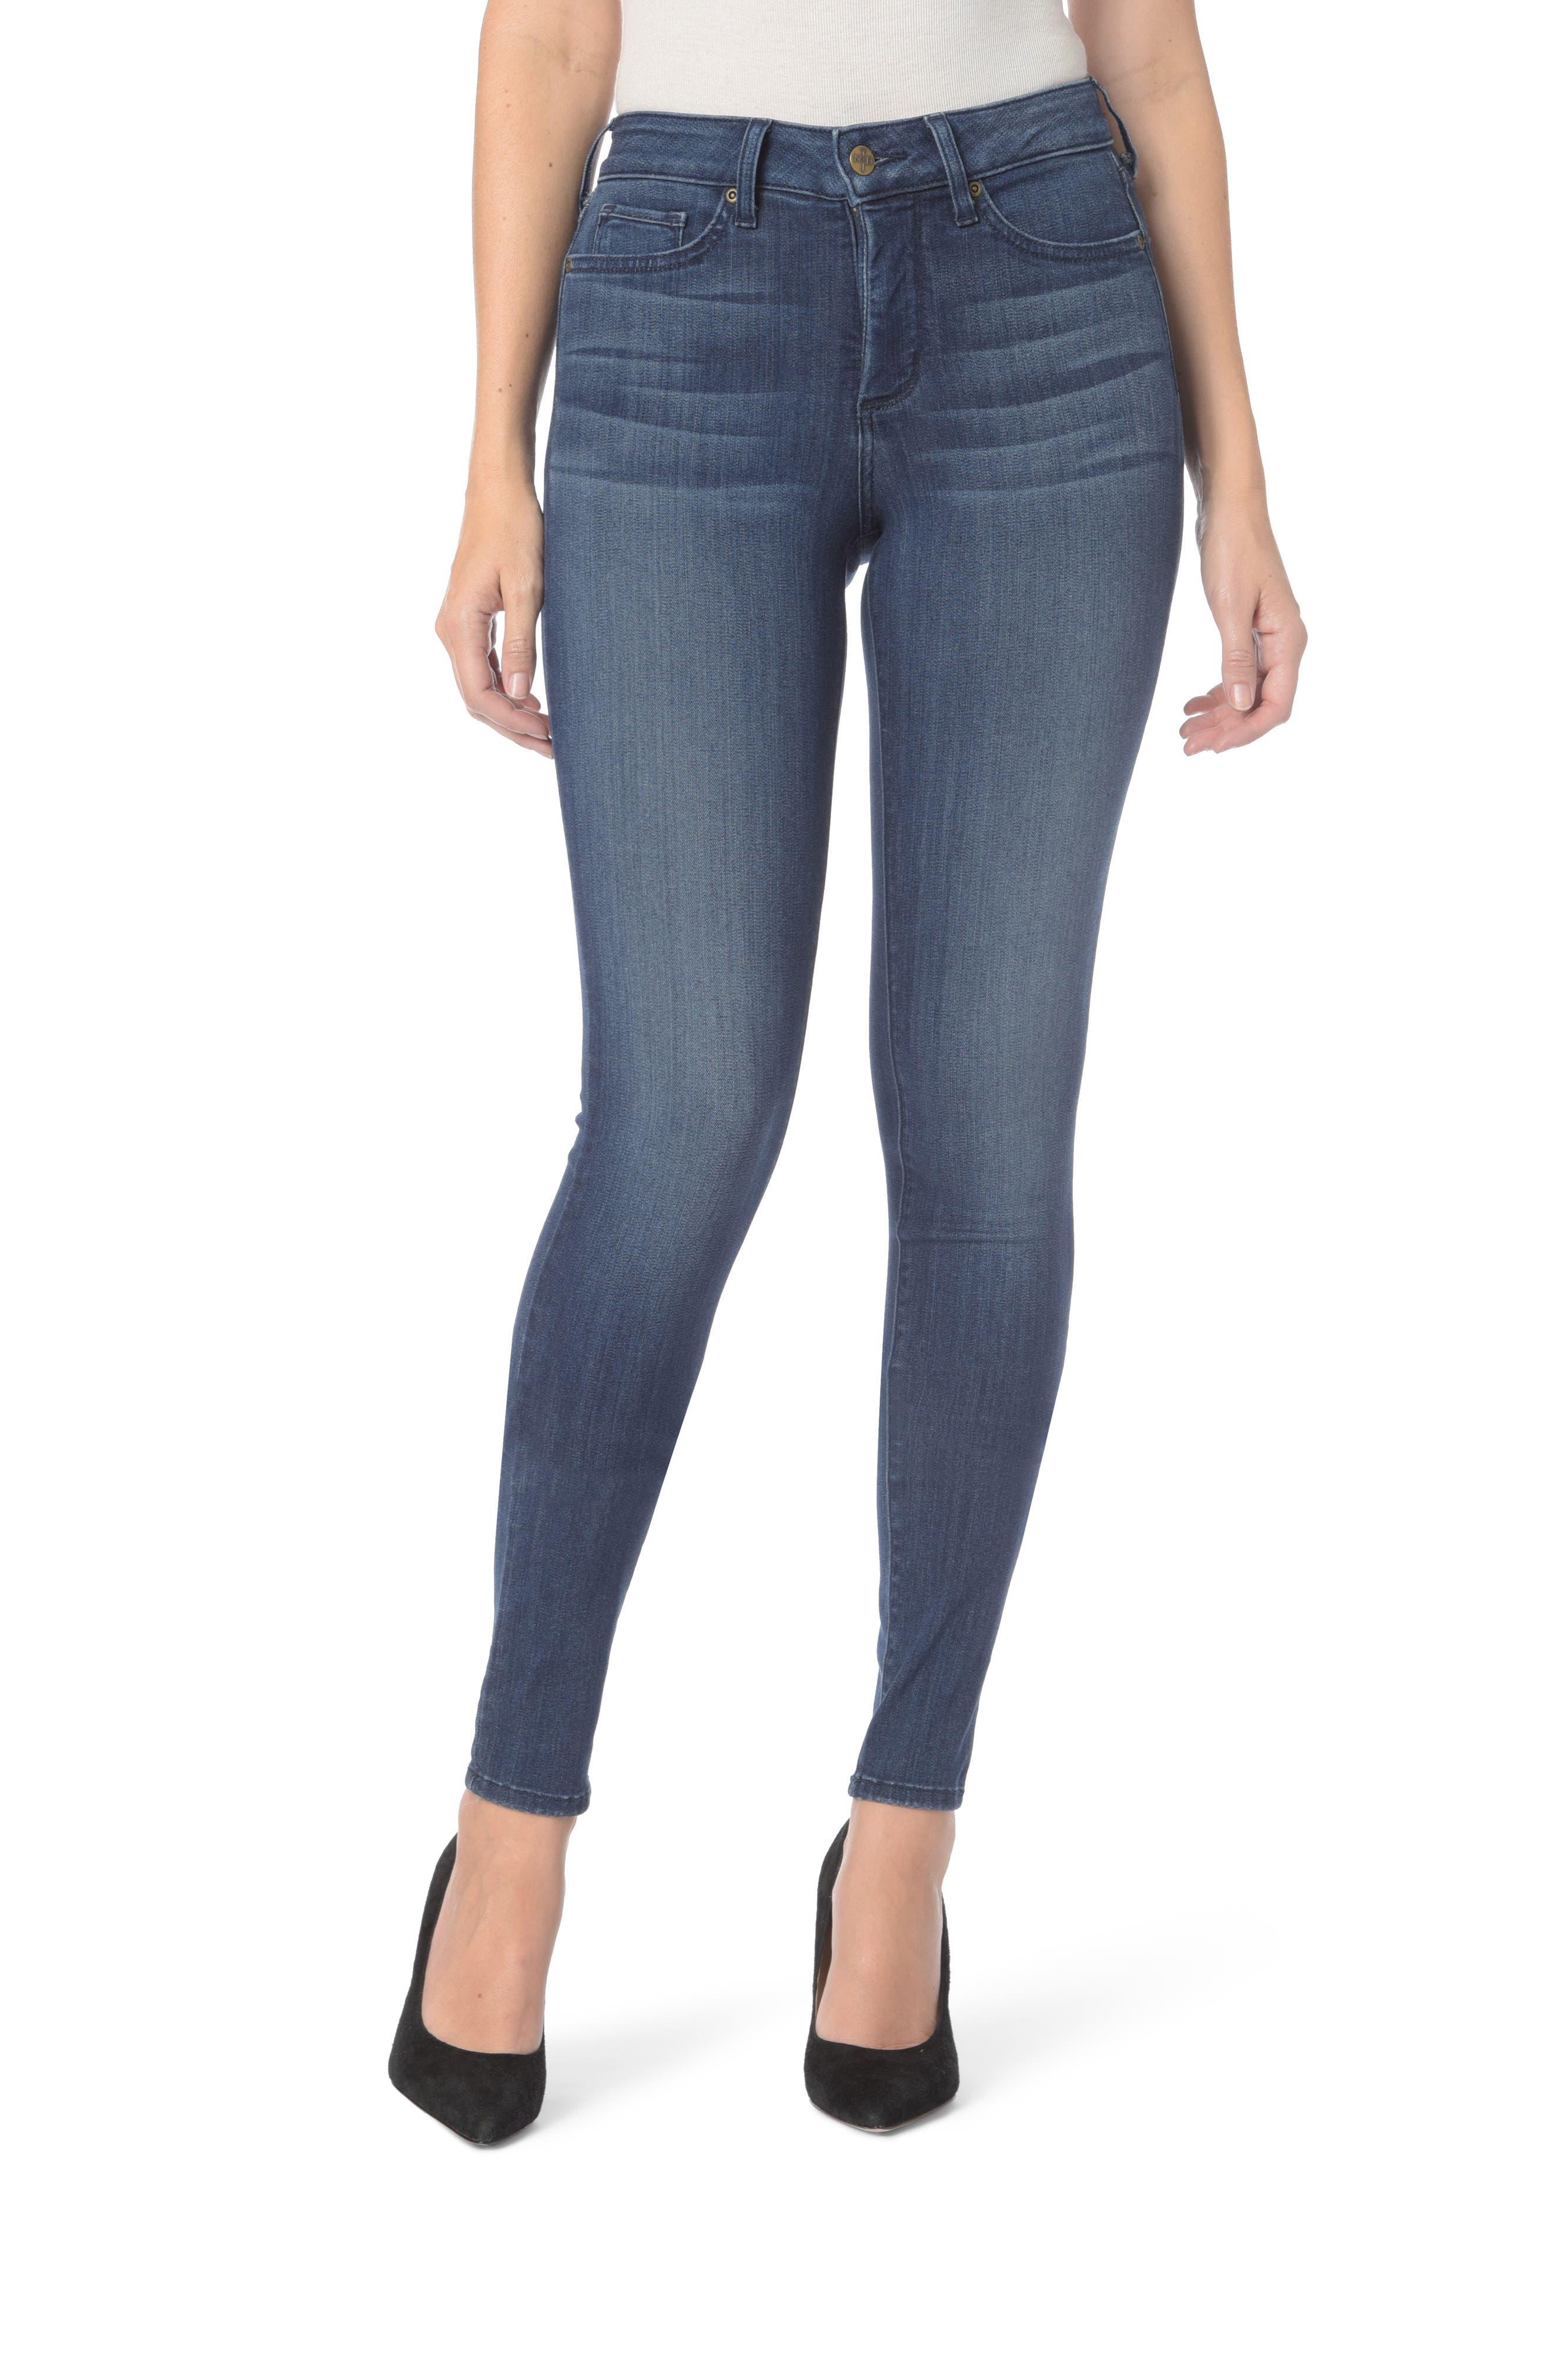 Ami Stretch Super Skinny Jeans,                         Main,                         color, Lark